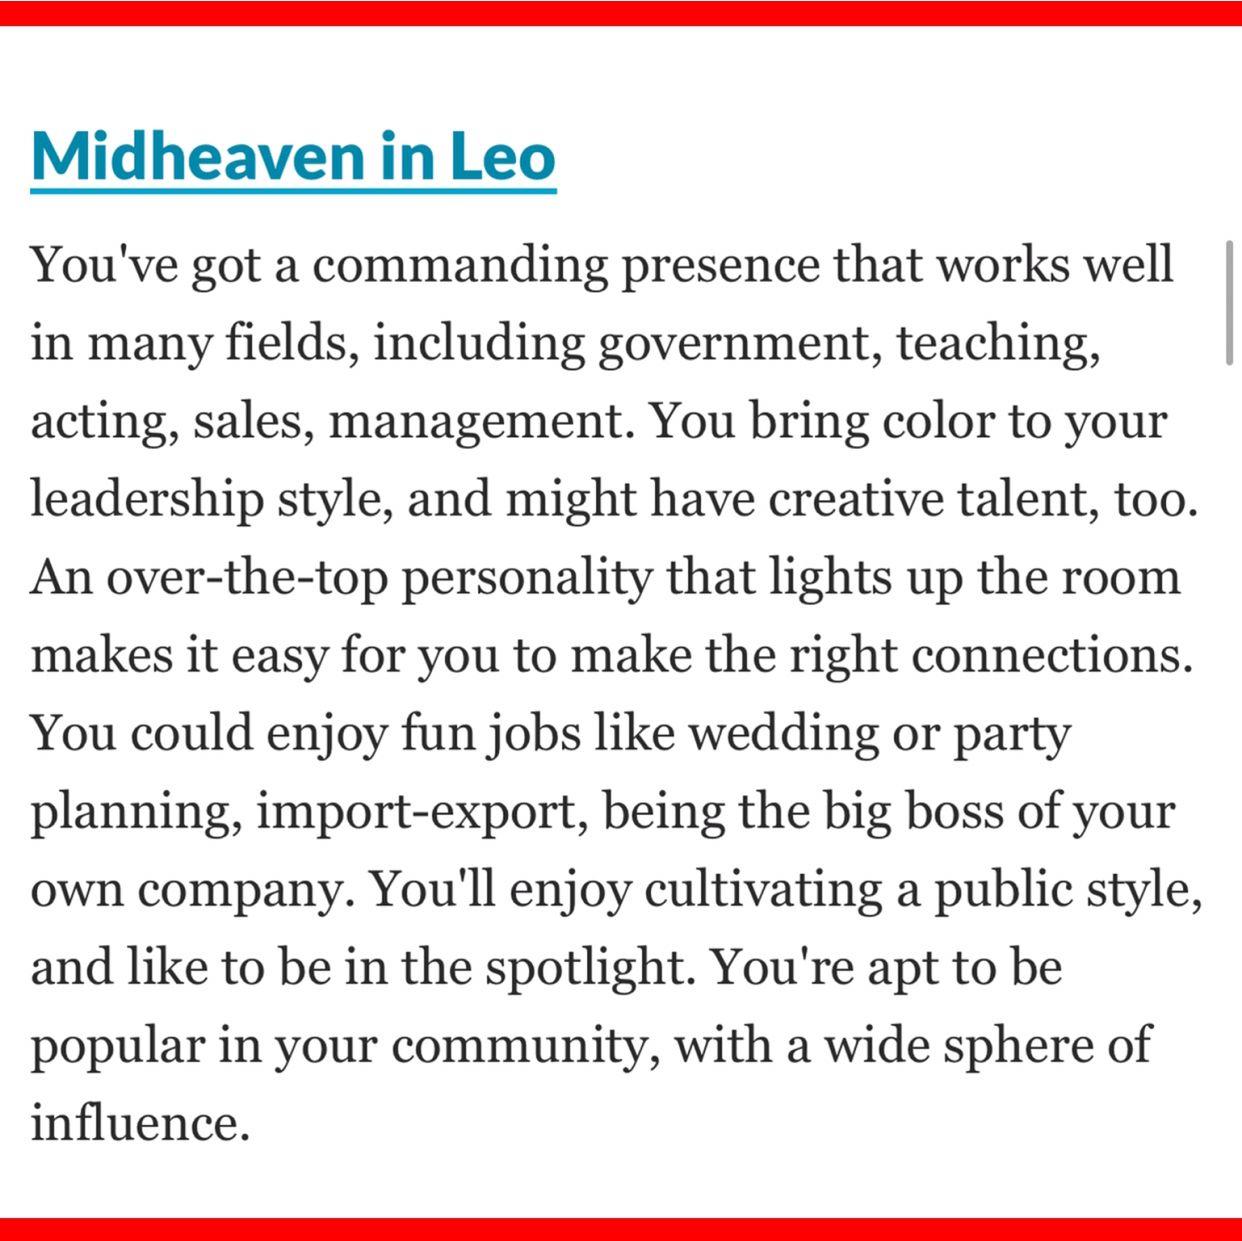 Midheaven in Leo- Leo in the 10th house | Spiritual